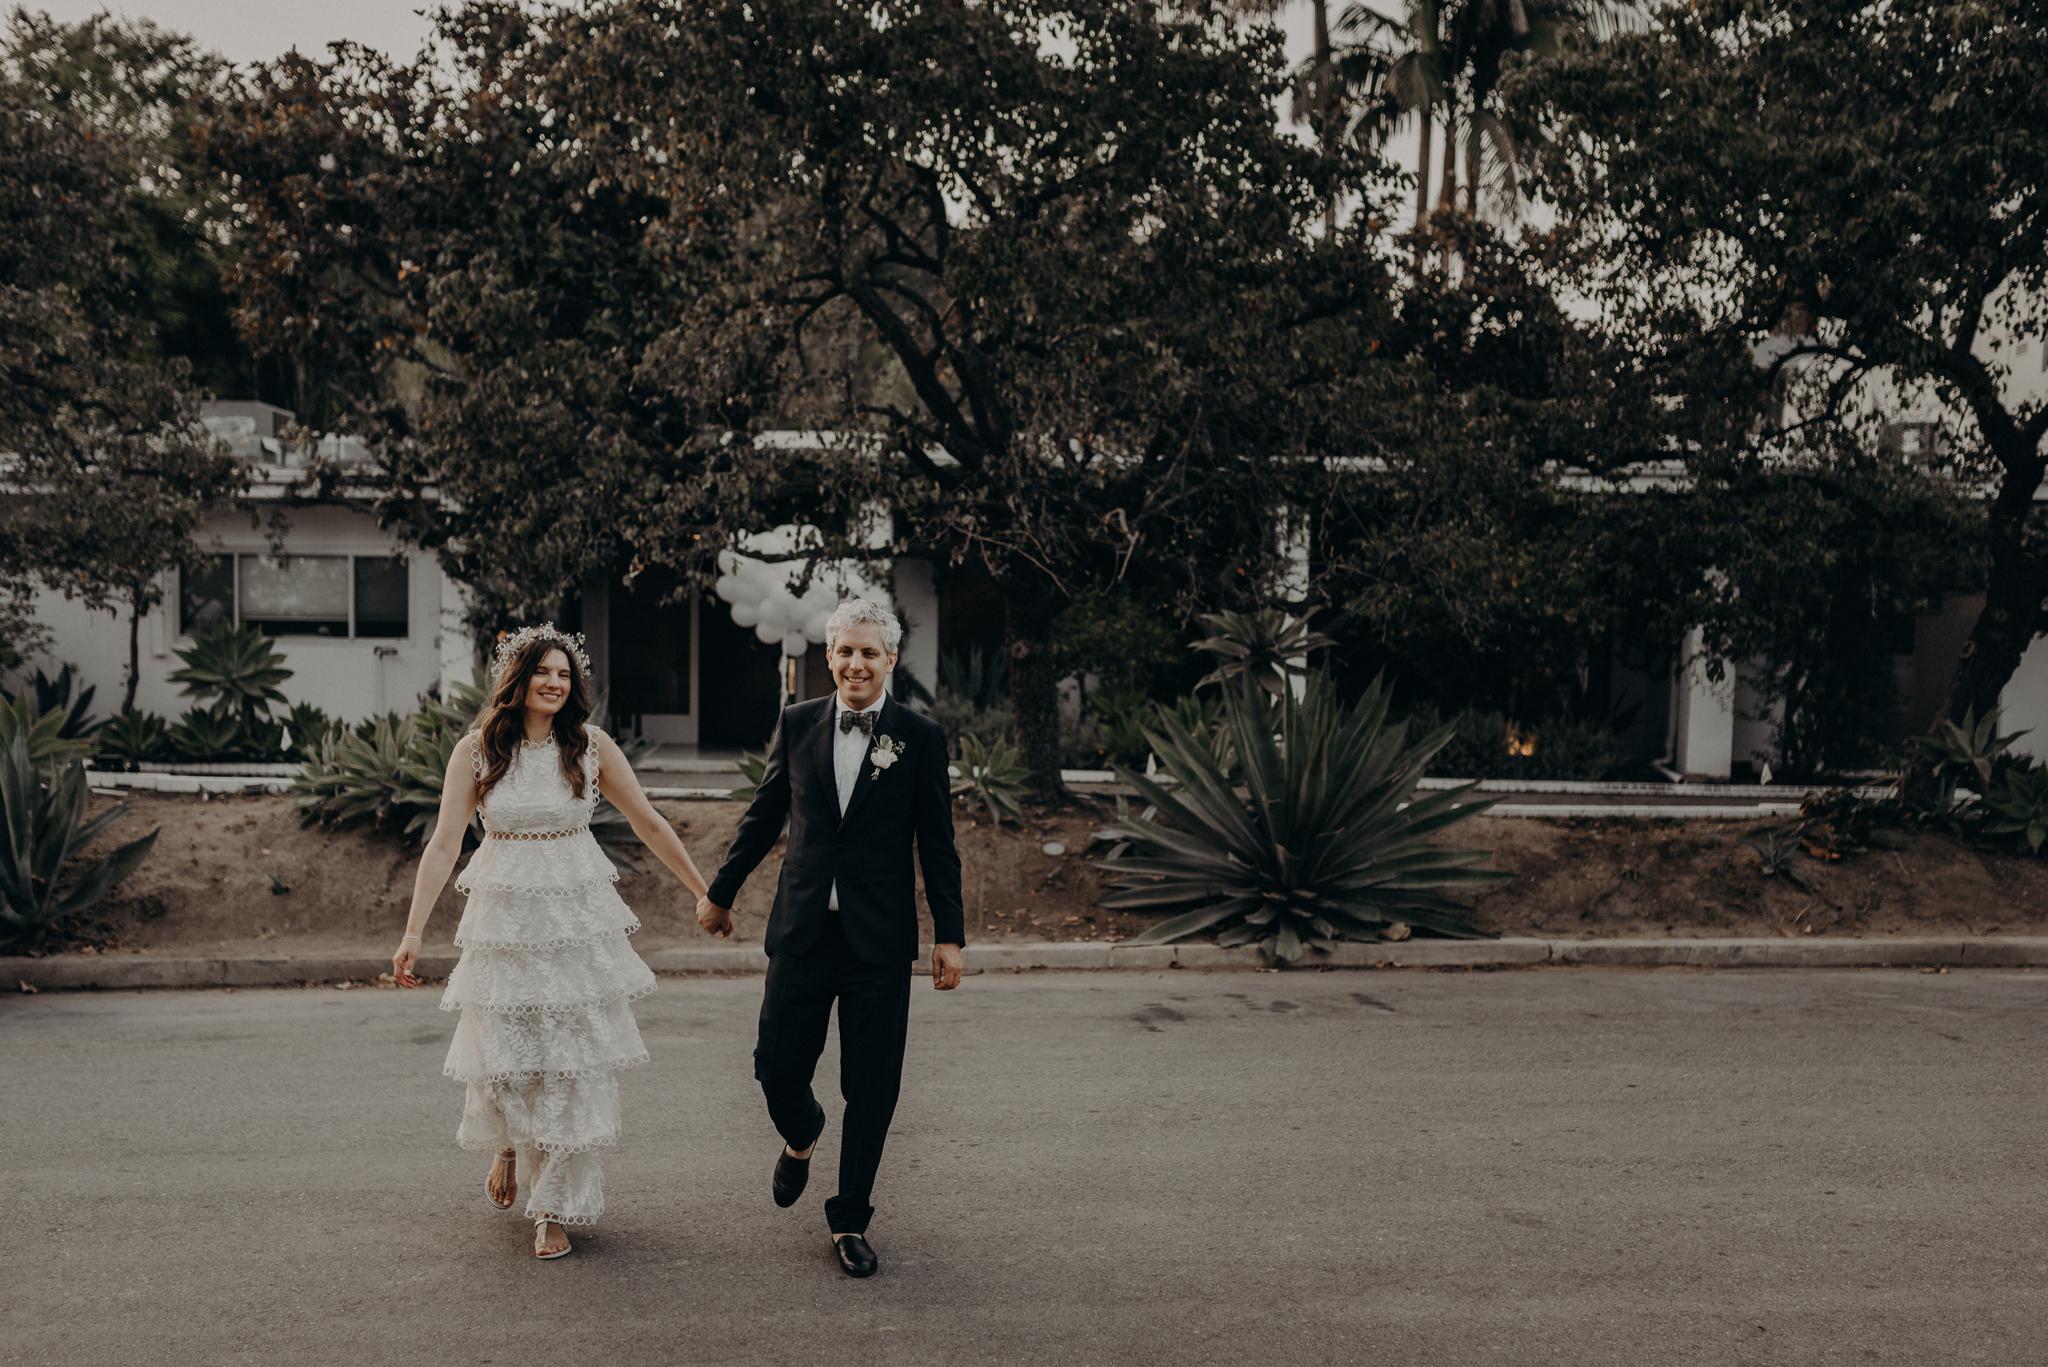 Isaiah + Taylor Photography - Private Estate Backyard Wedding - Beverly Hills - Los Angeles Wedding Photographer - 110.jpg